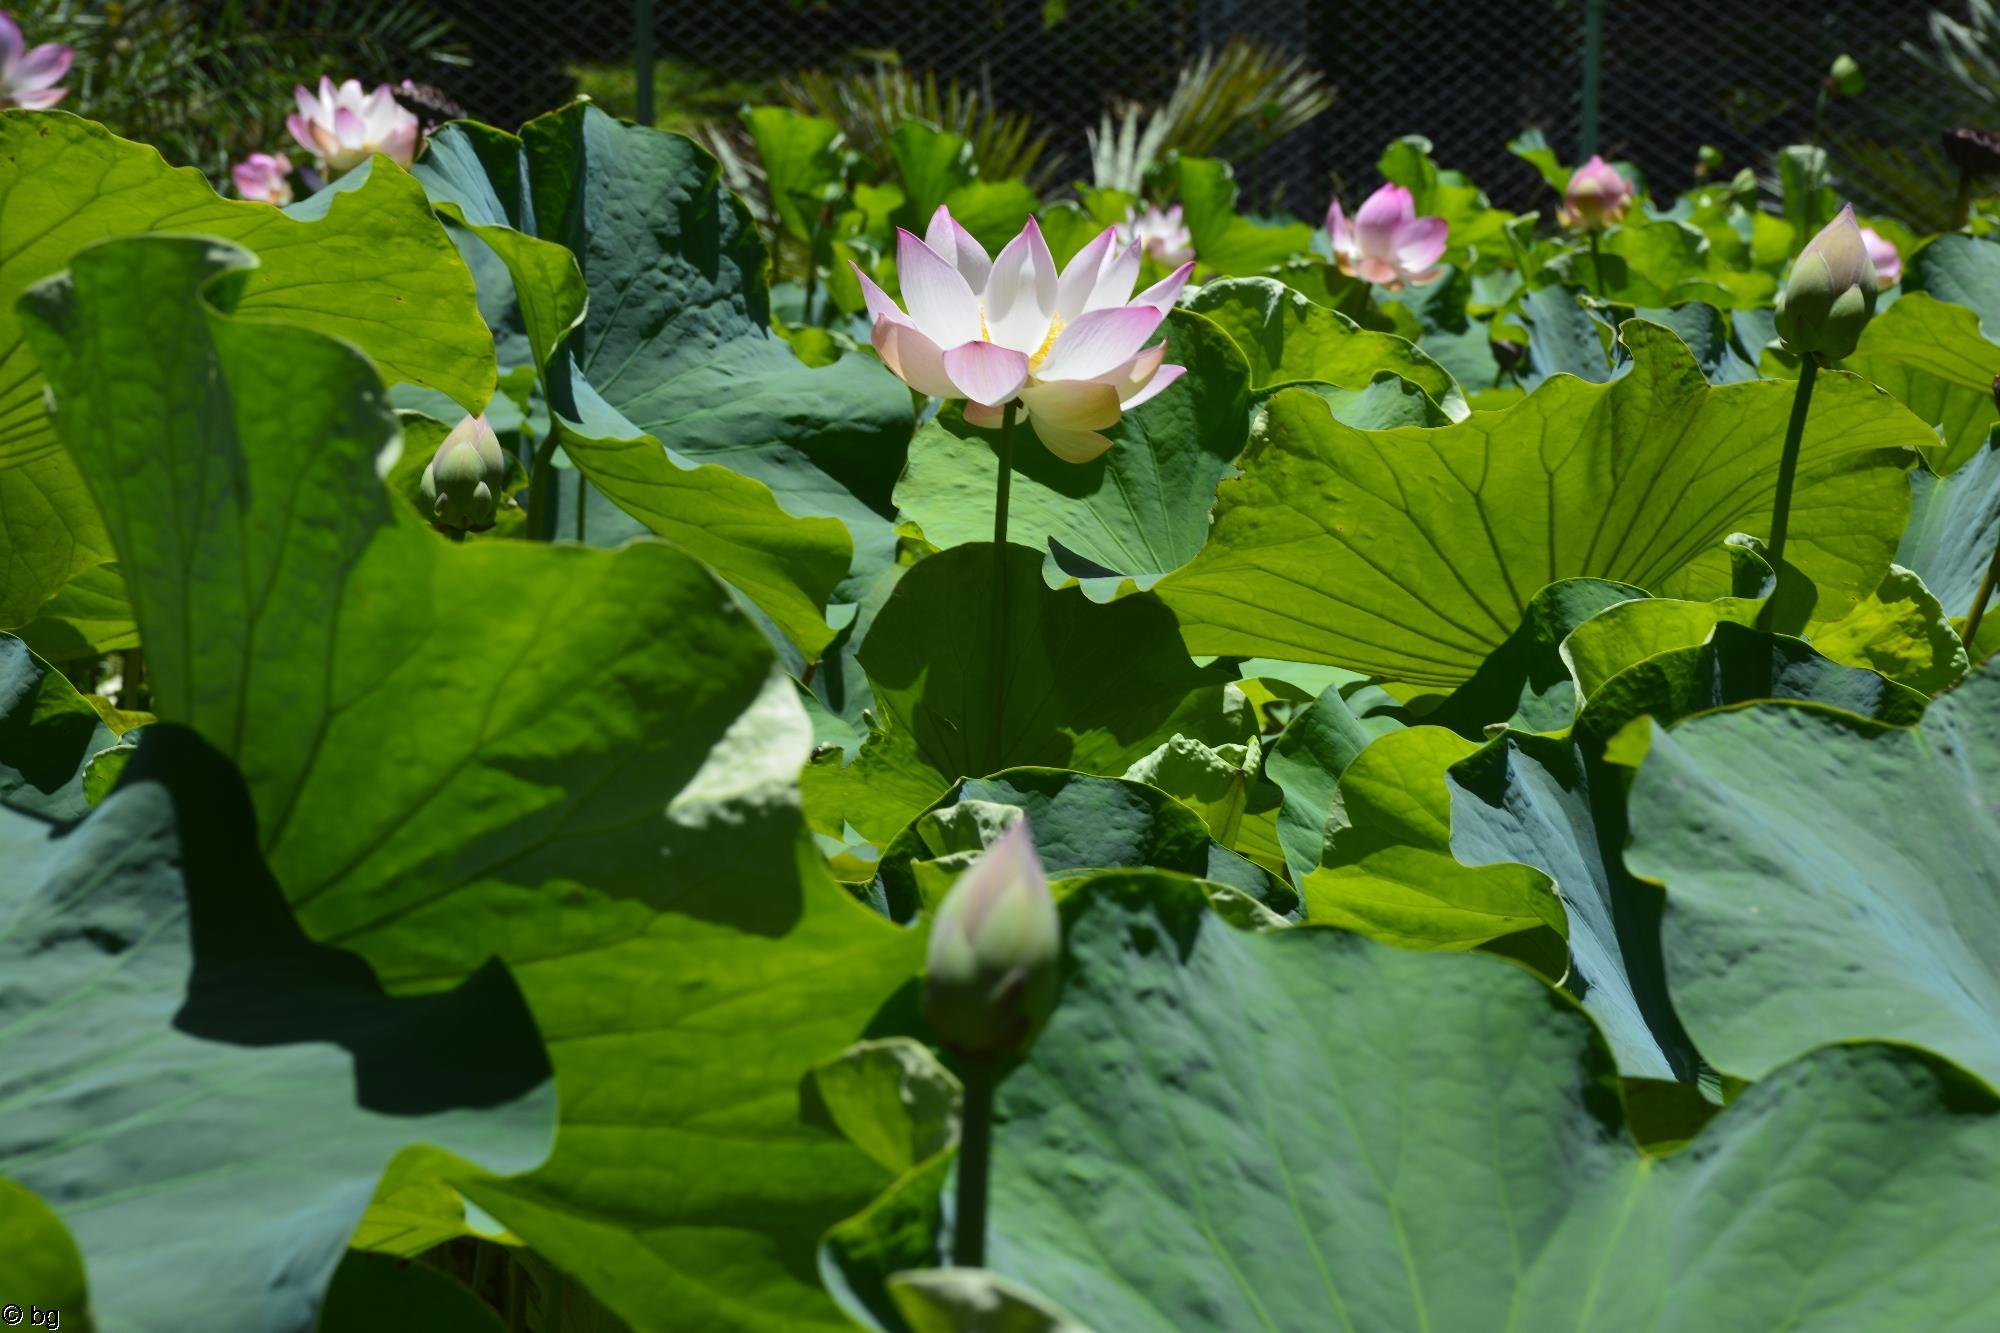 fleurs-de-lotus_bassin-naturel_1